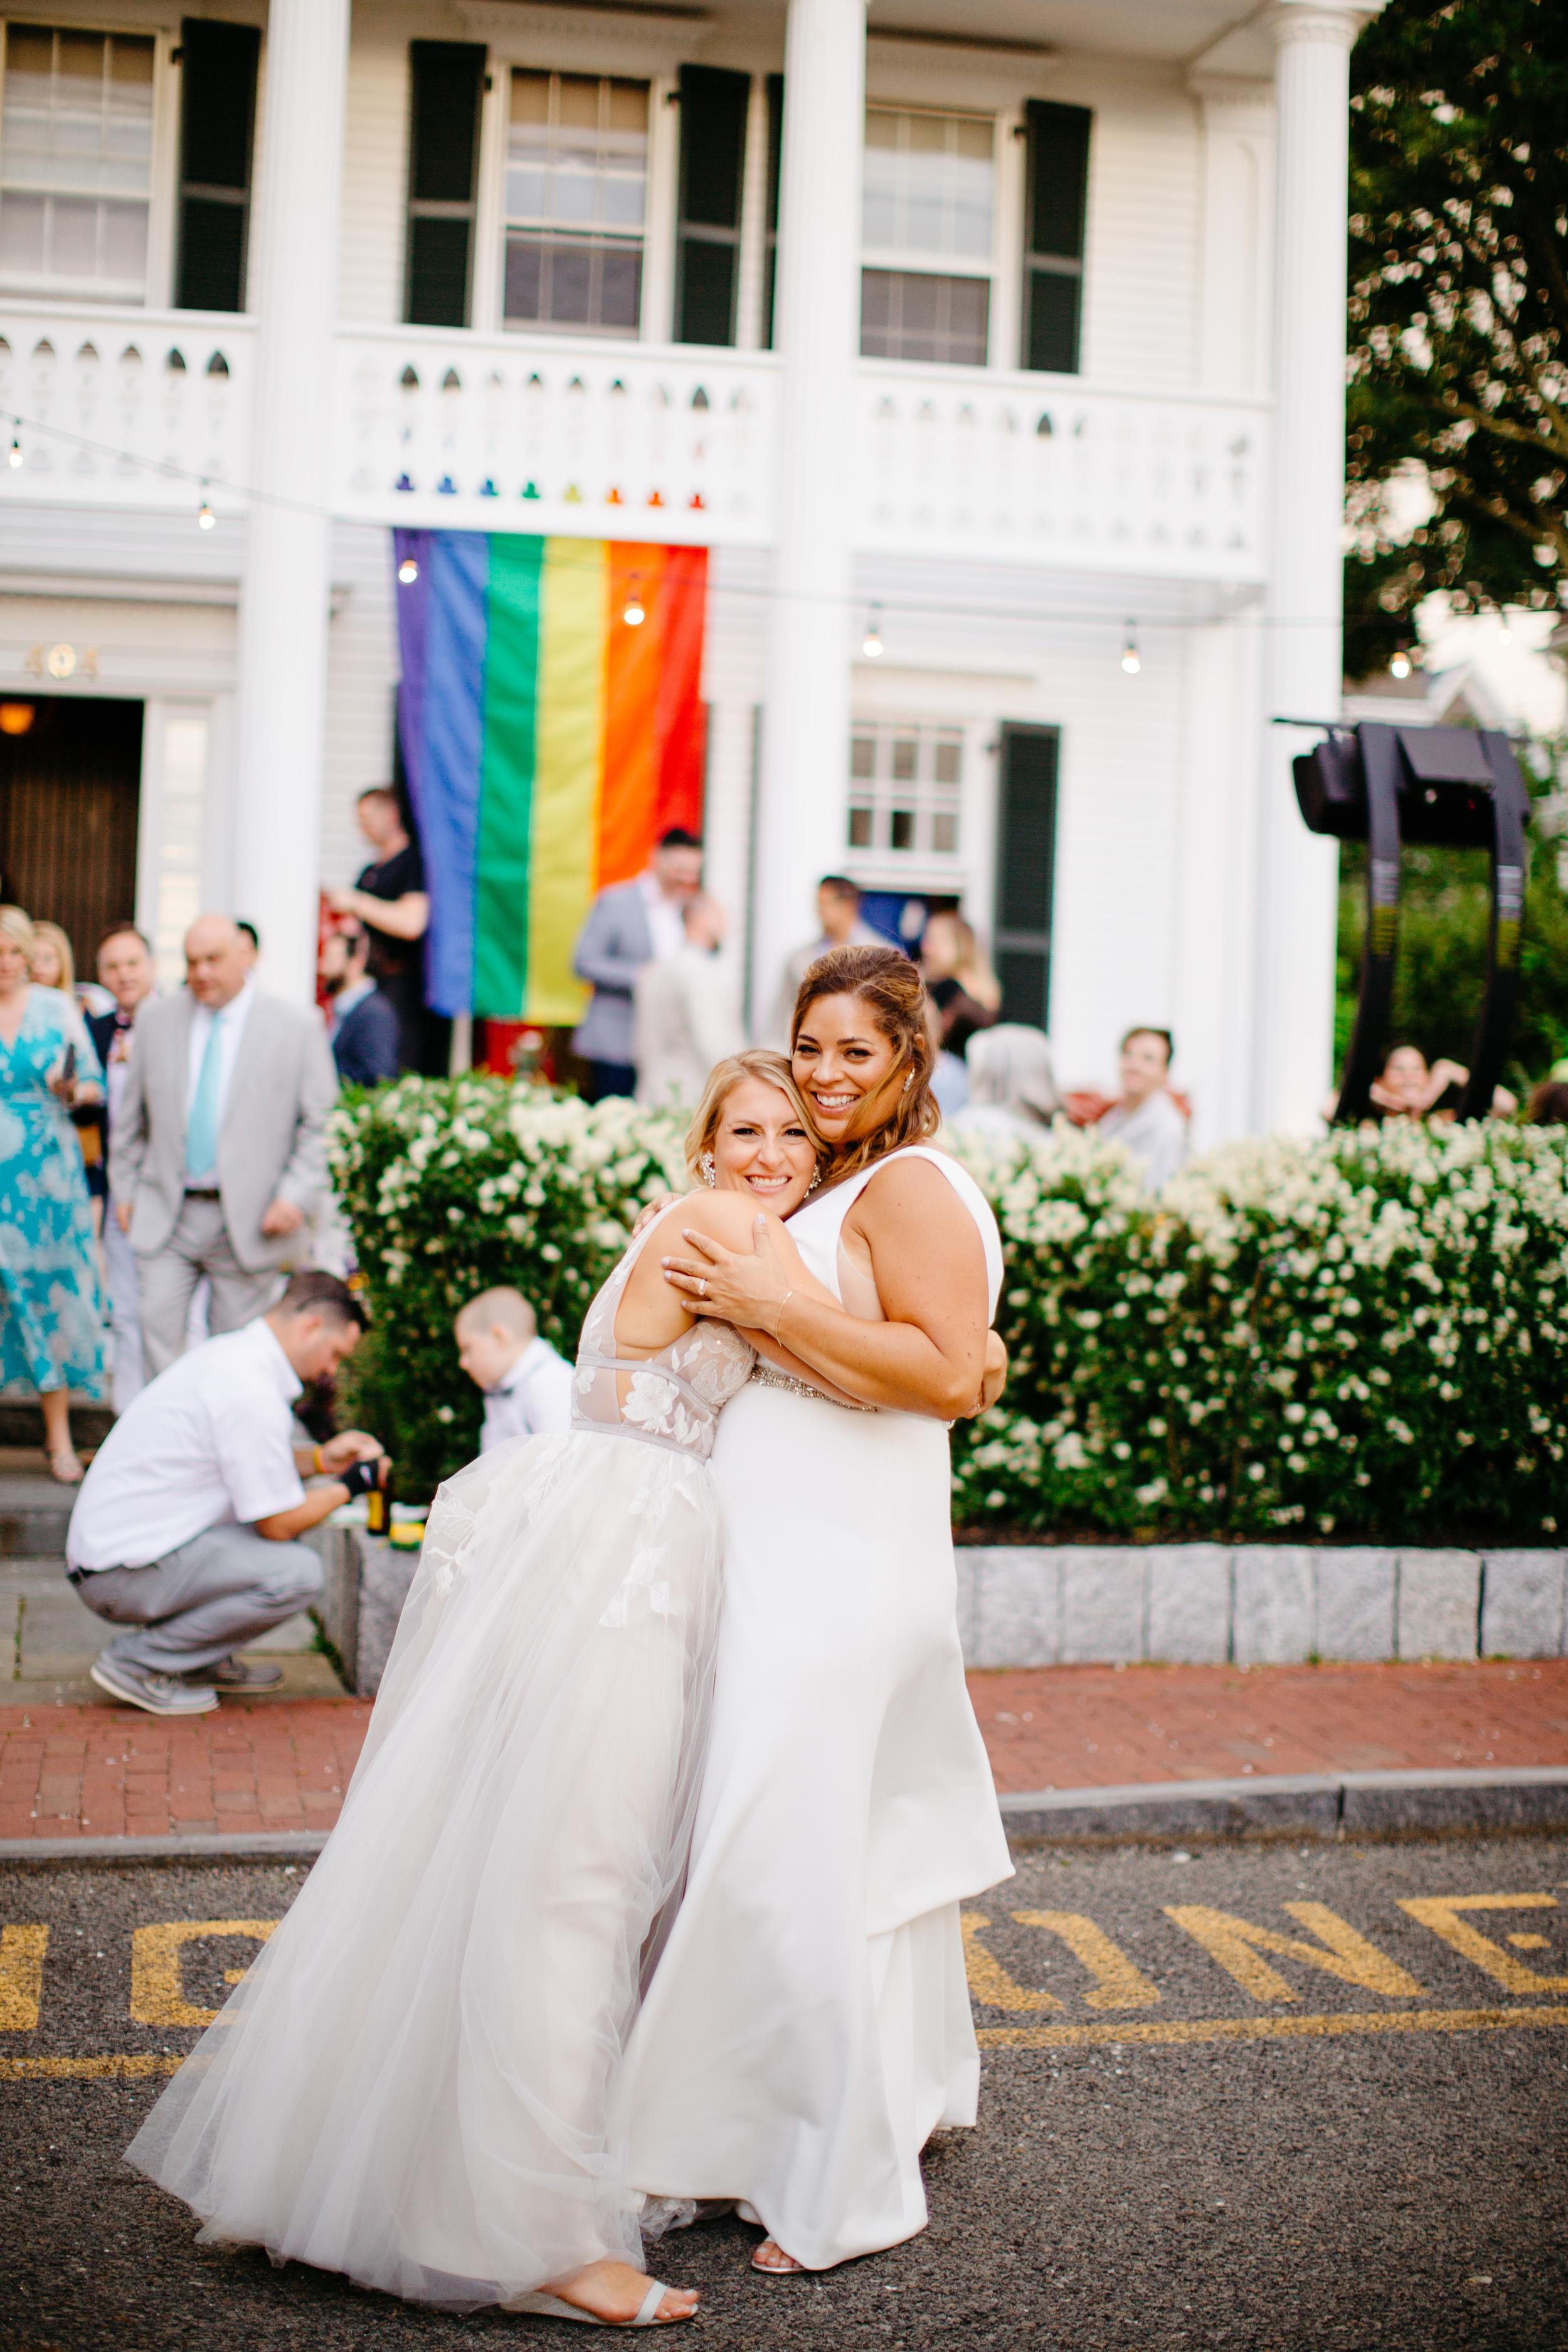 provincetown_same_sex_downtown_wedding_44.JPG